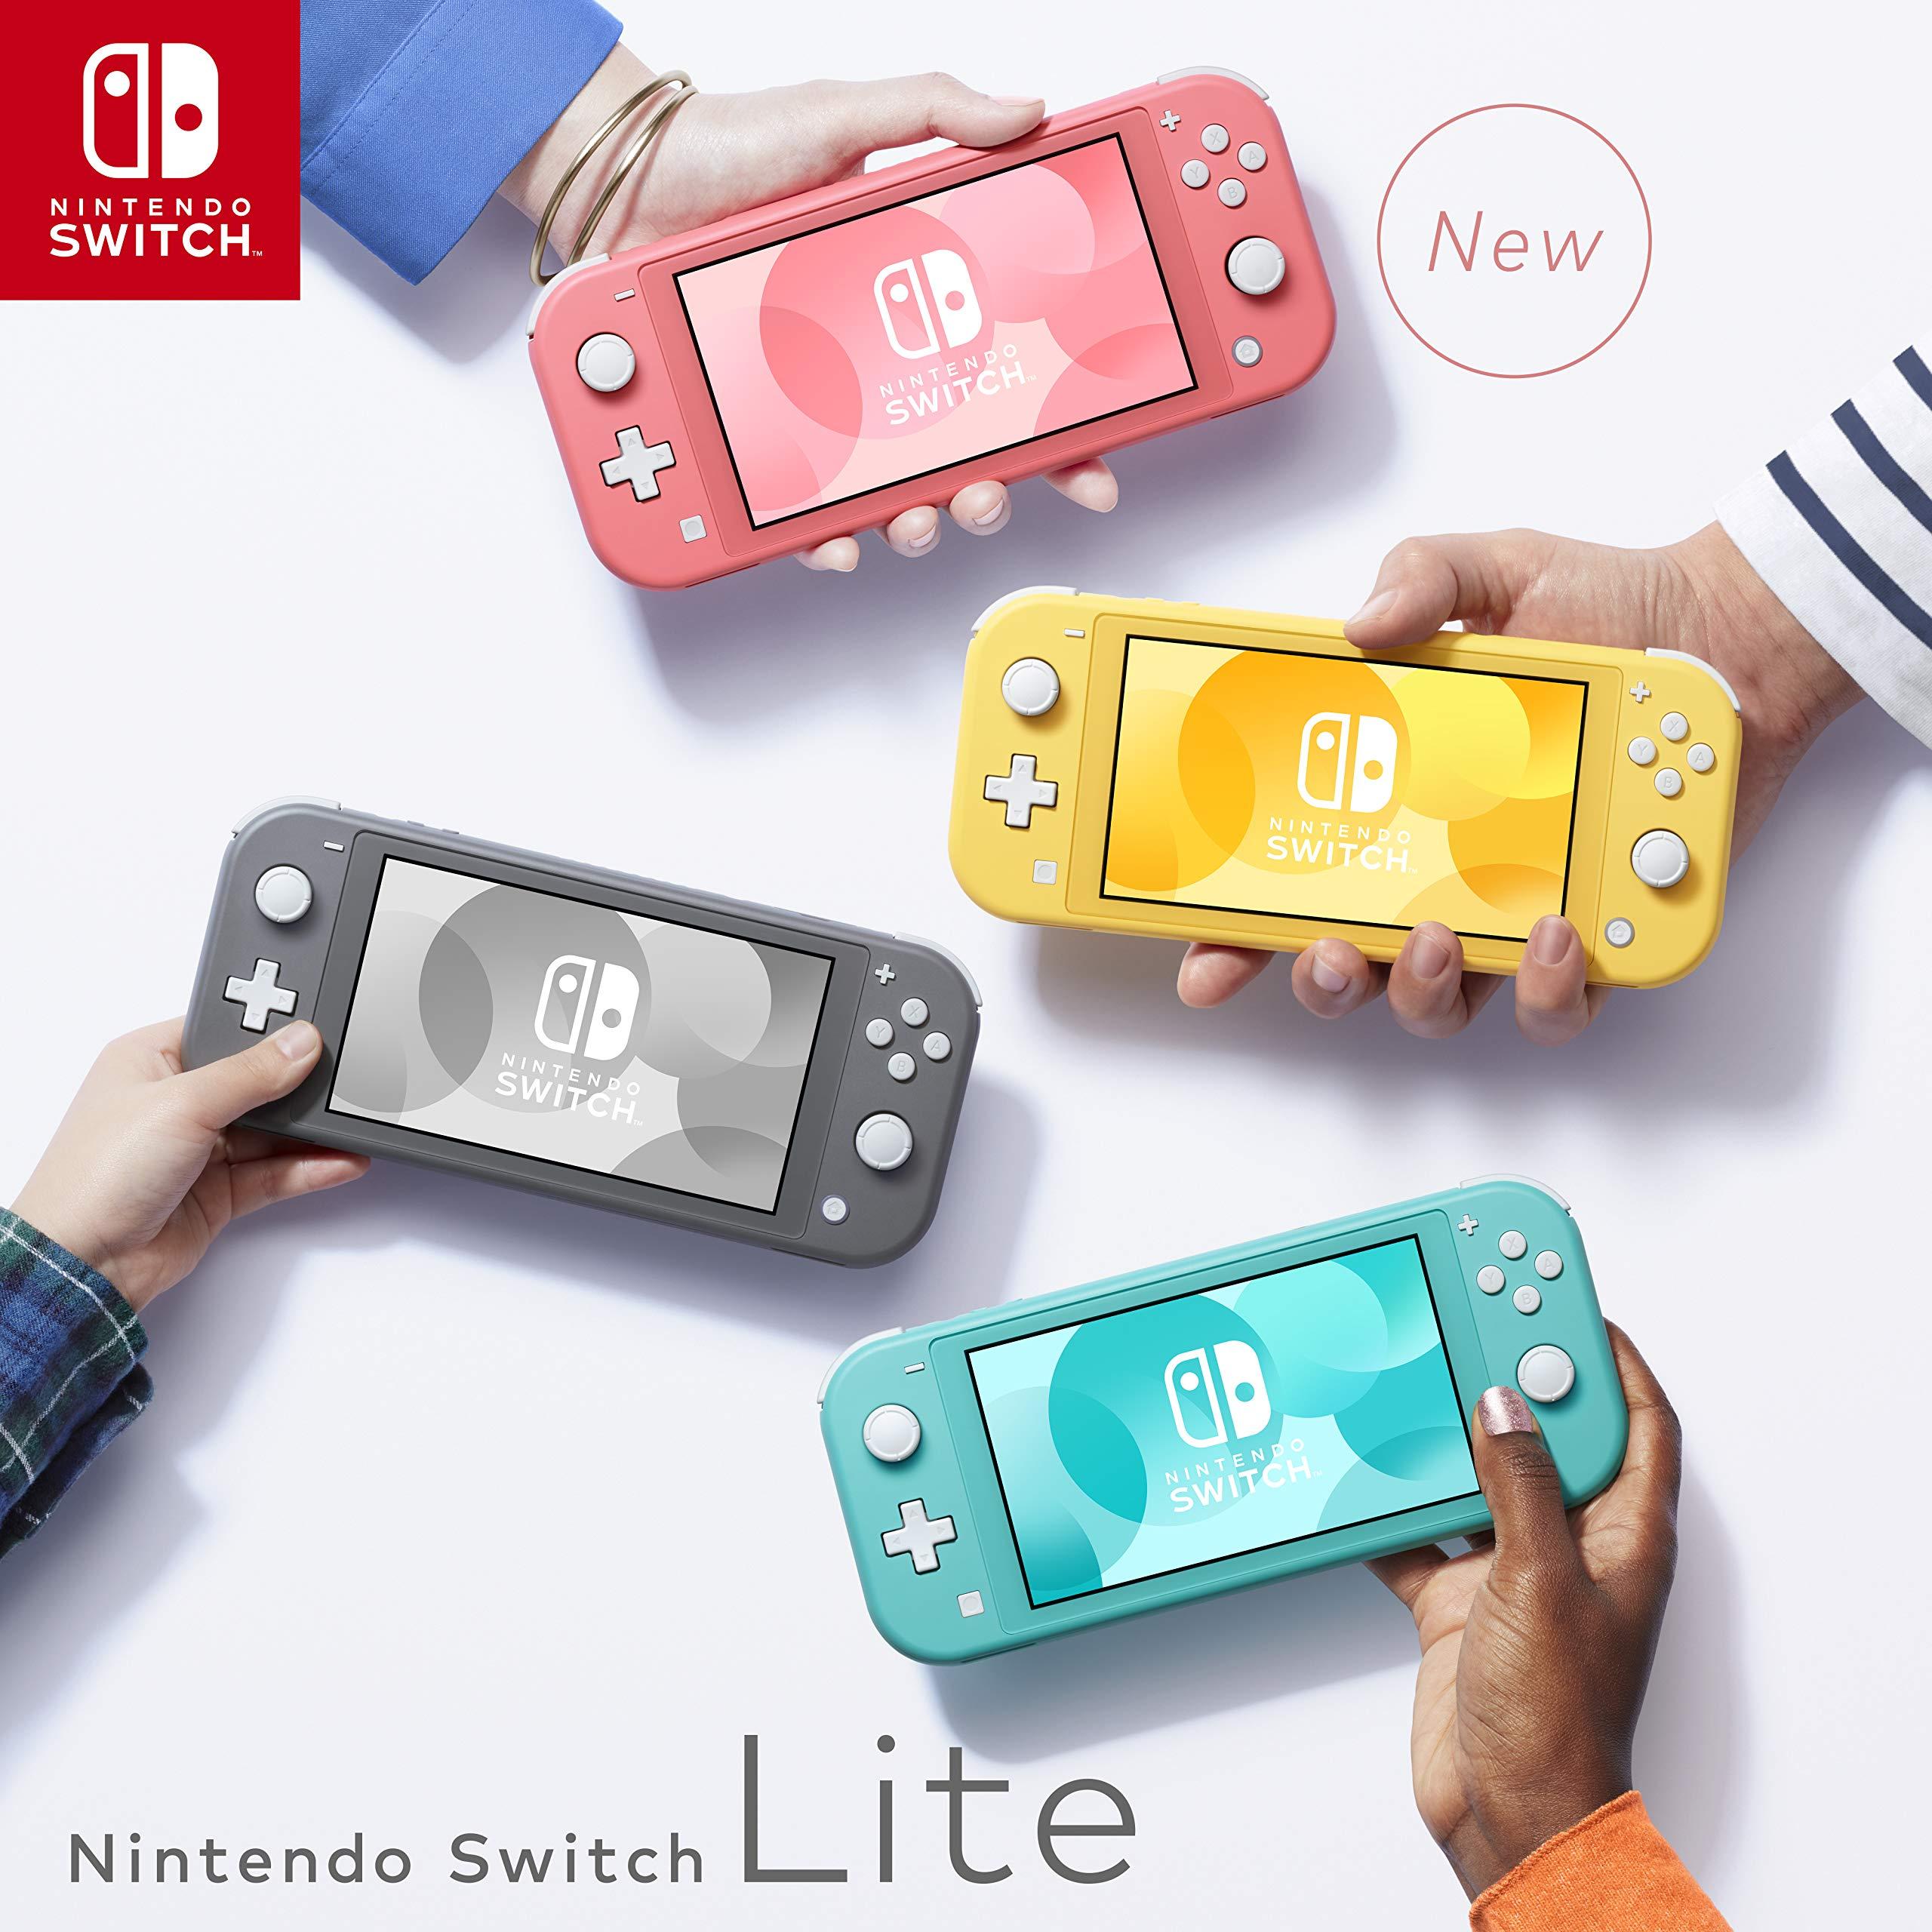 nintendo-switch-lite-new-nobox